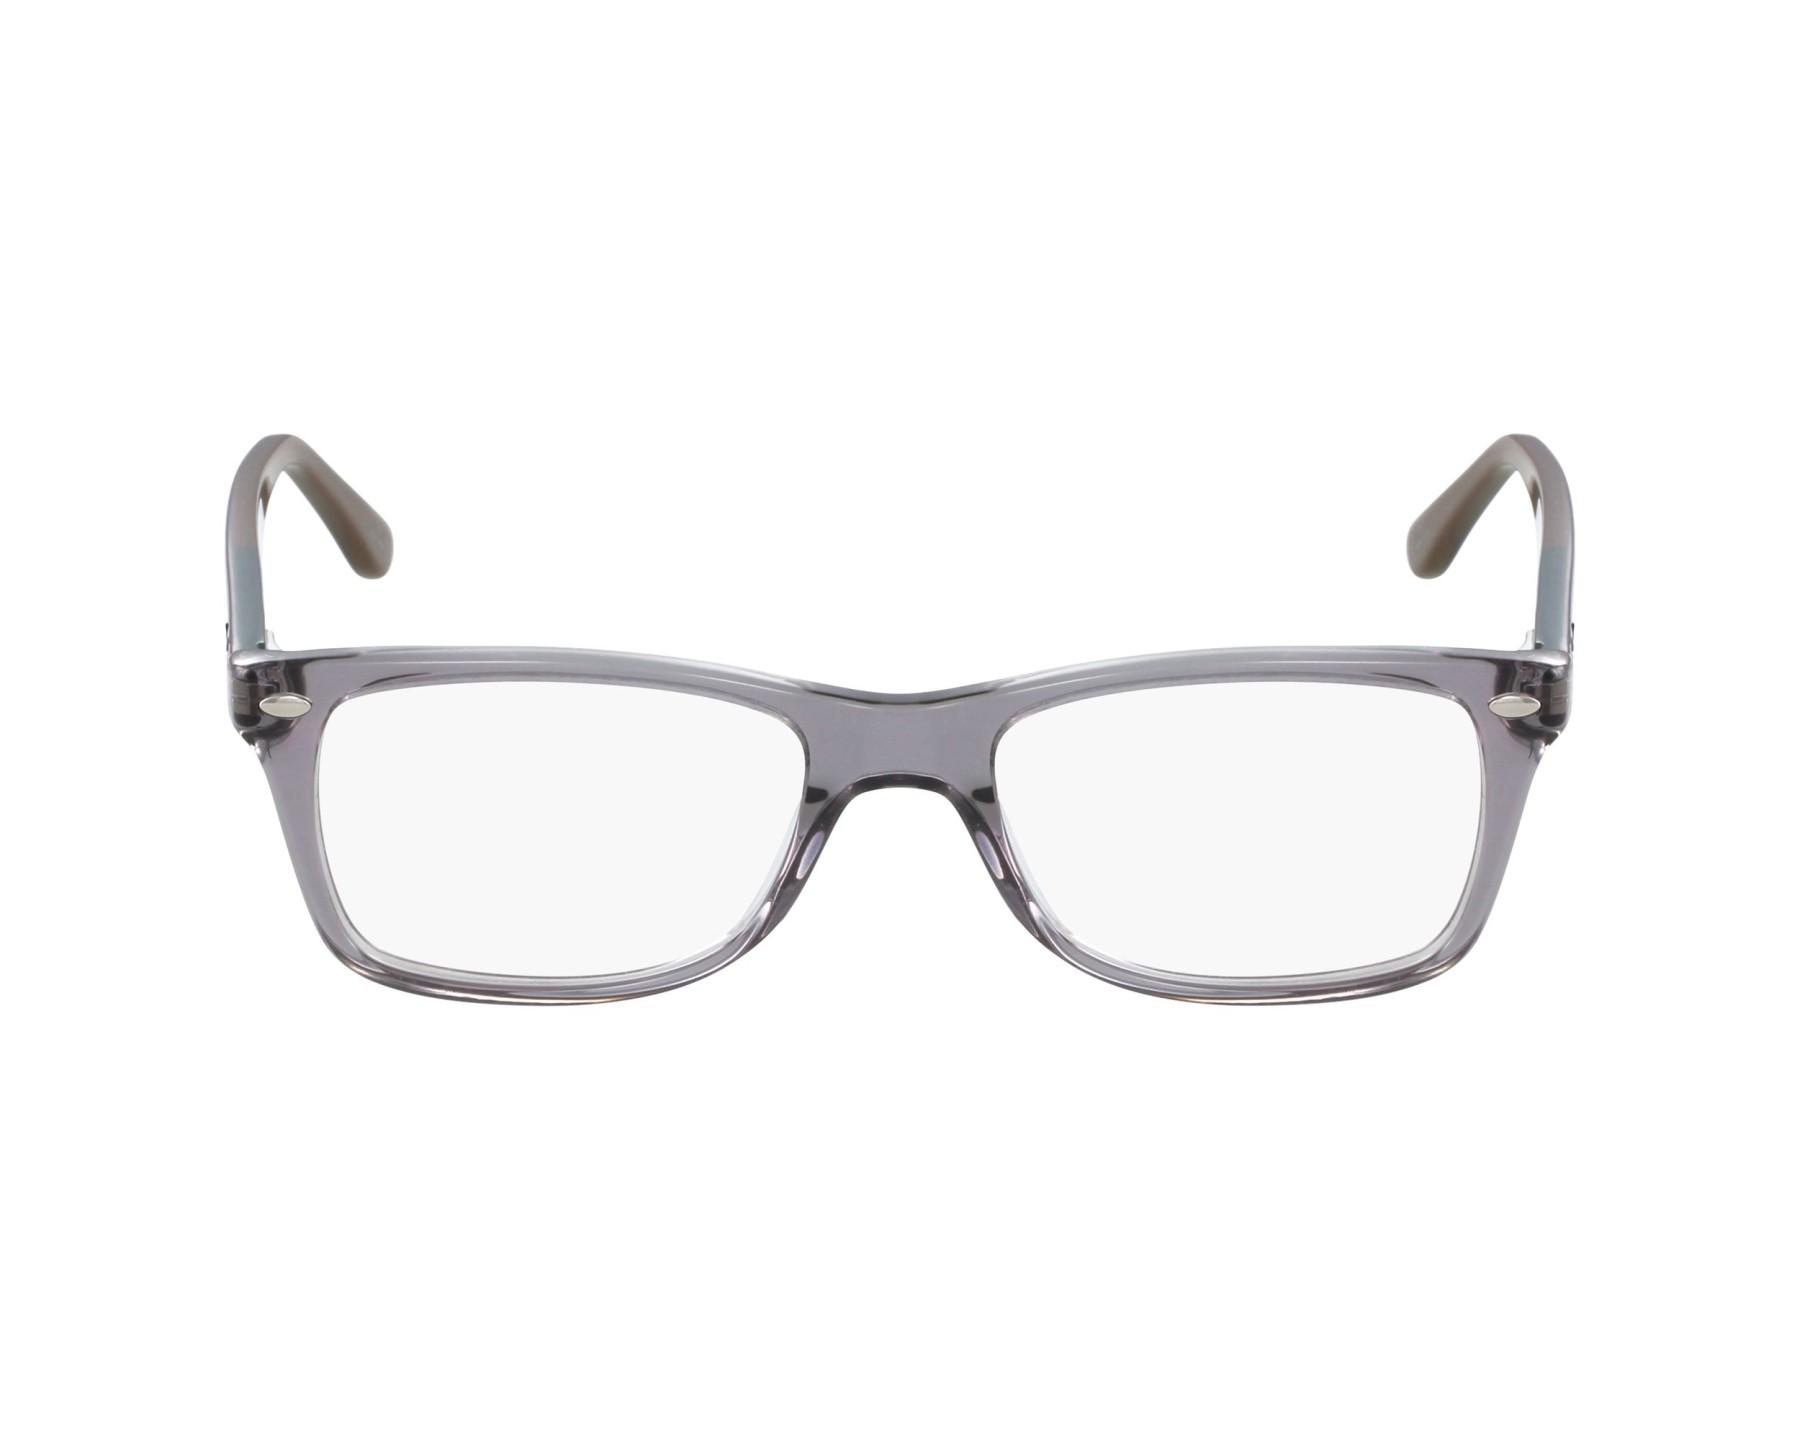 6014855e86 eyeglasses Ray-Ban RX-5228 5546 53-17 Grey Blue profile view